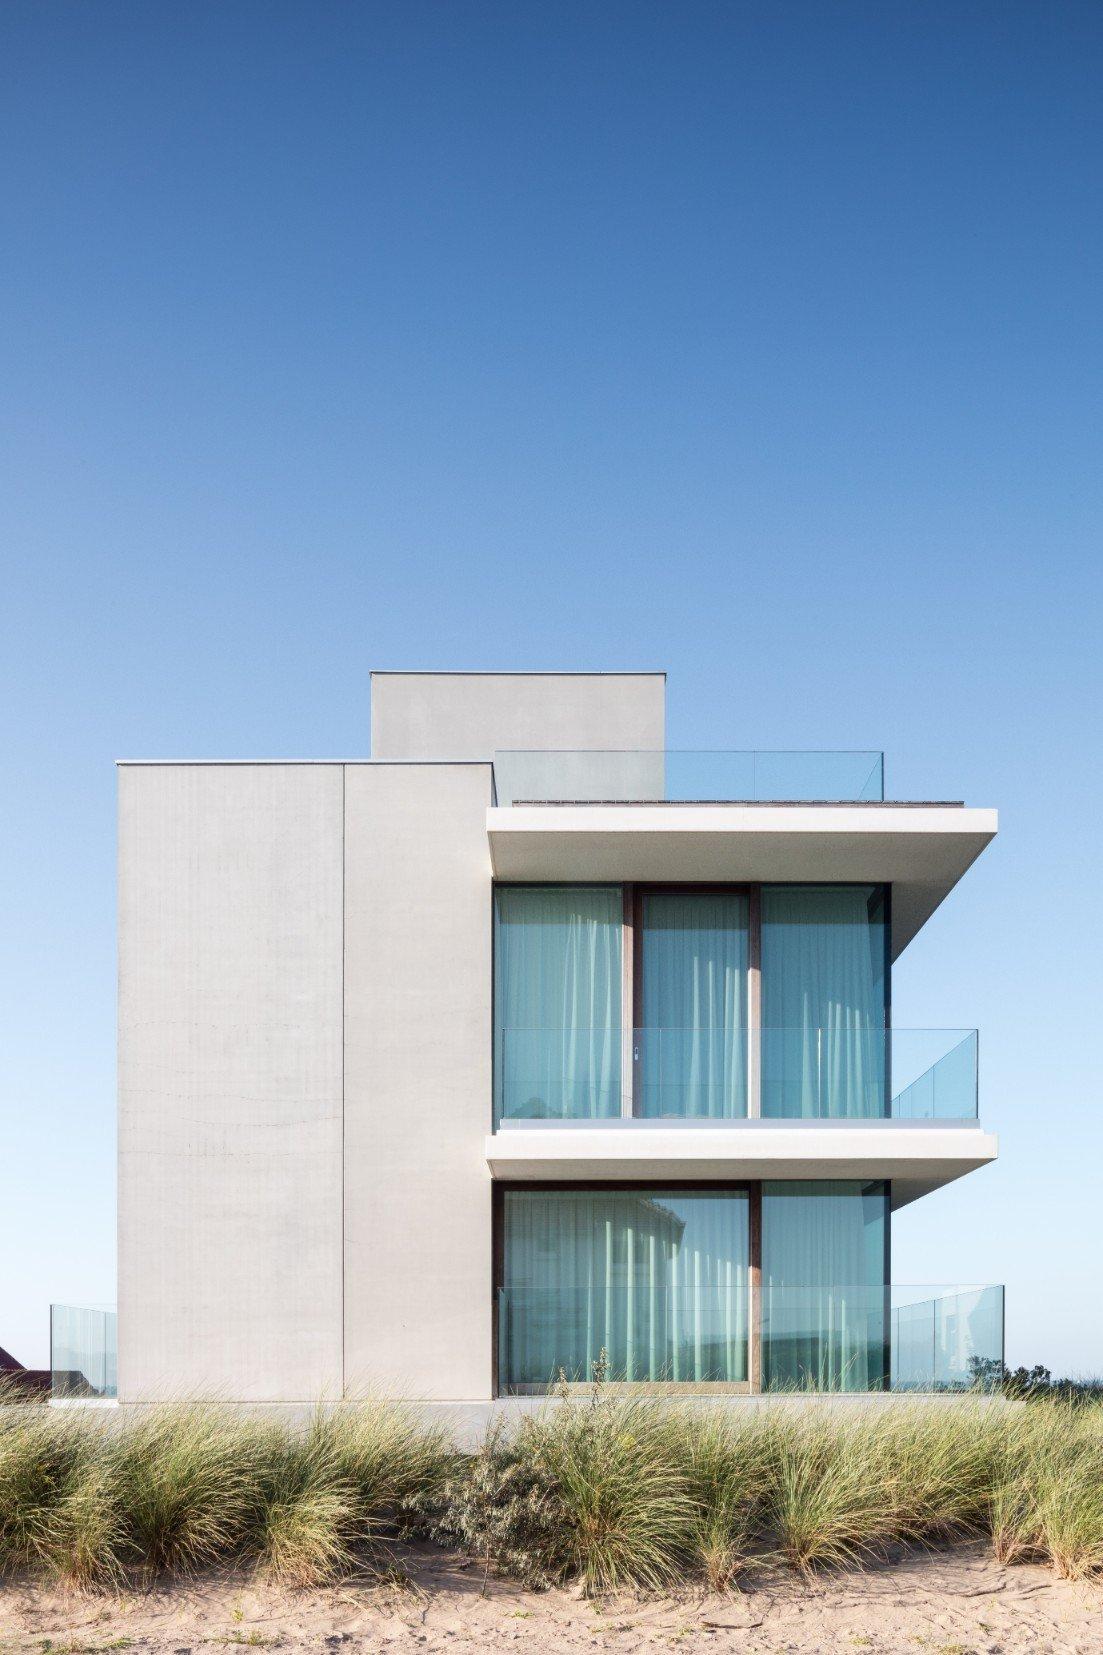 Rietveldprojects-Residence-ON-appartement-design-architectuur-kust-tvdv2.jpg